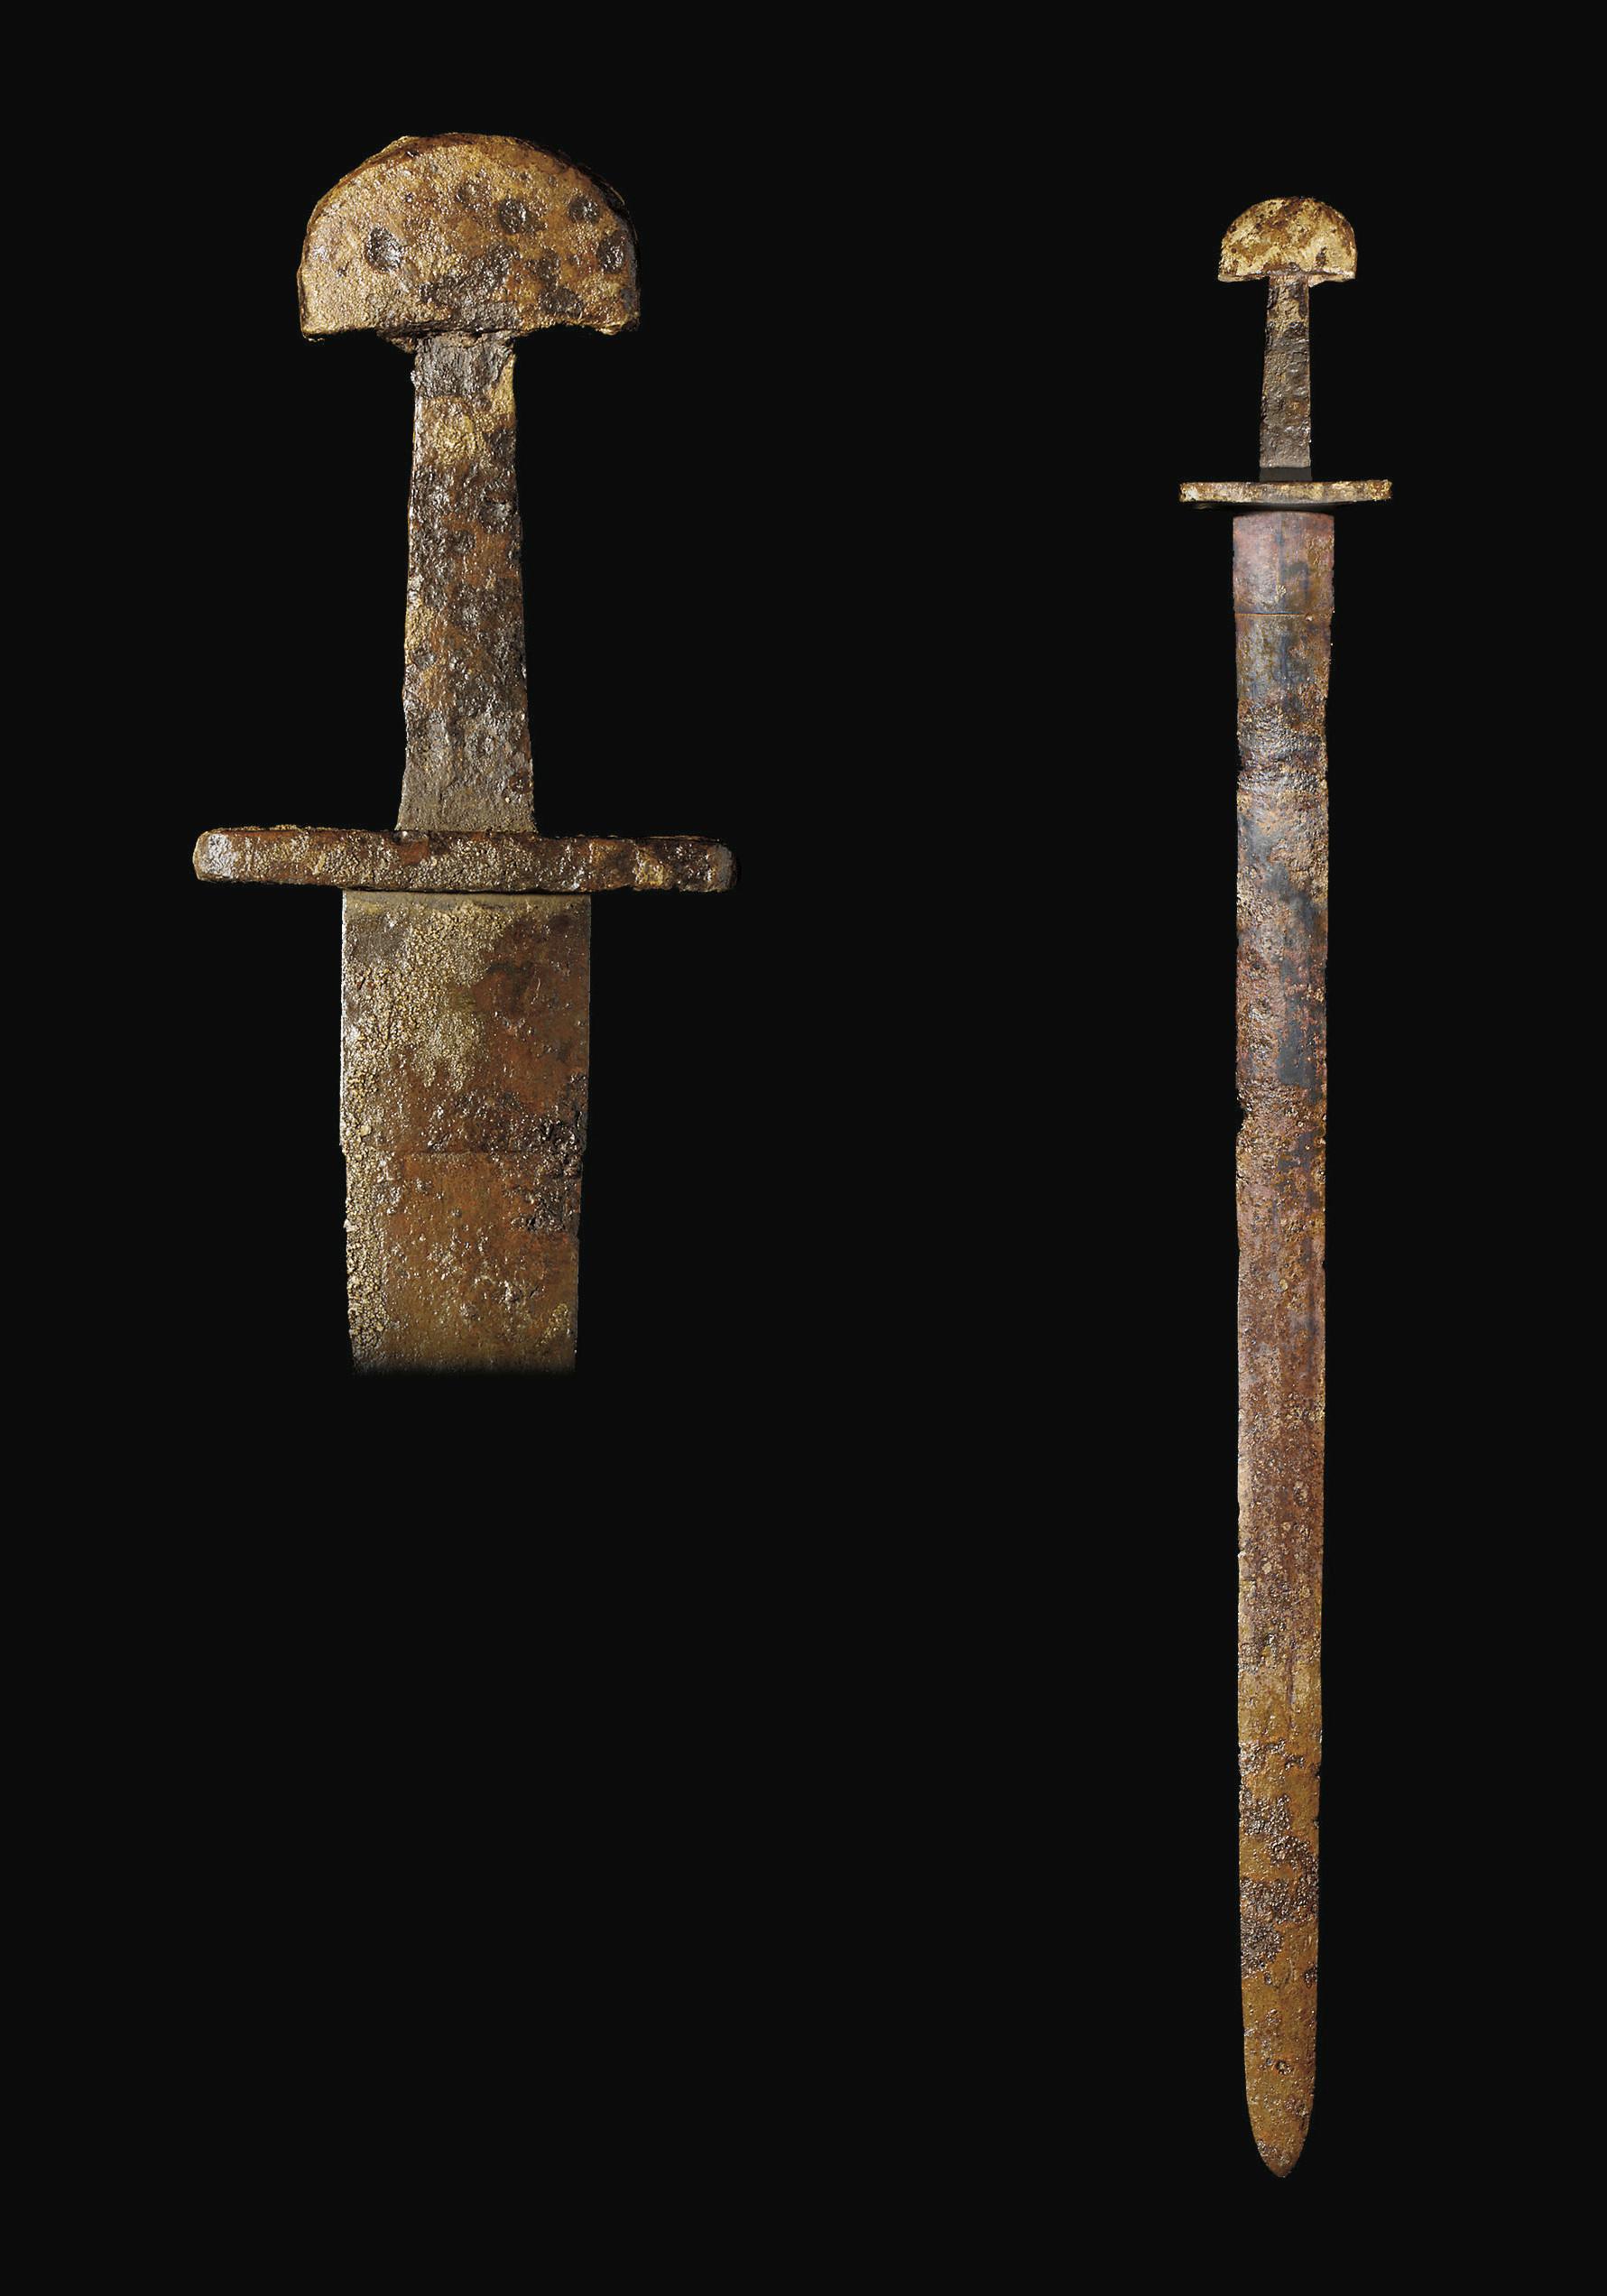 A FINE VIKING SWORD